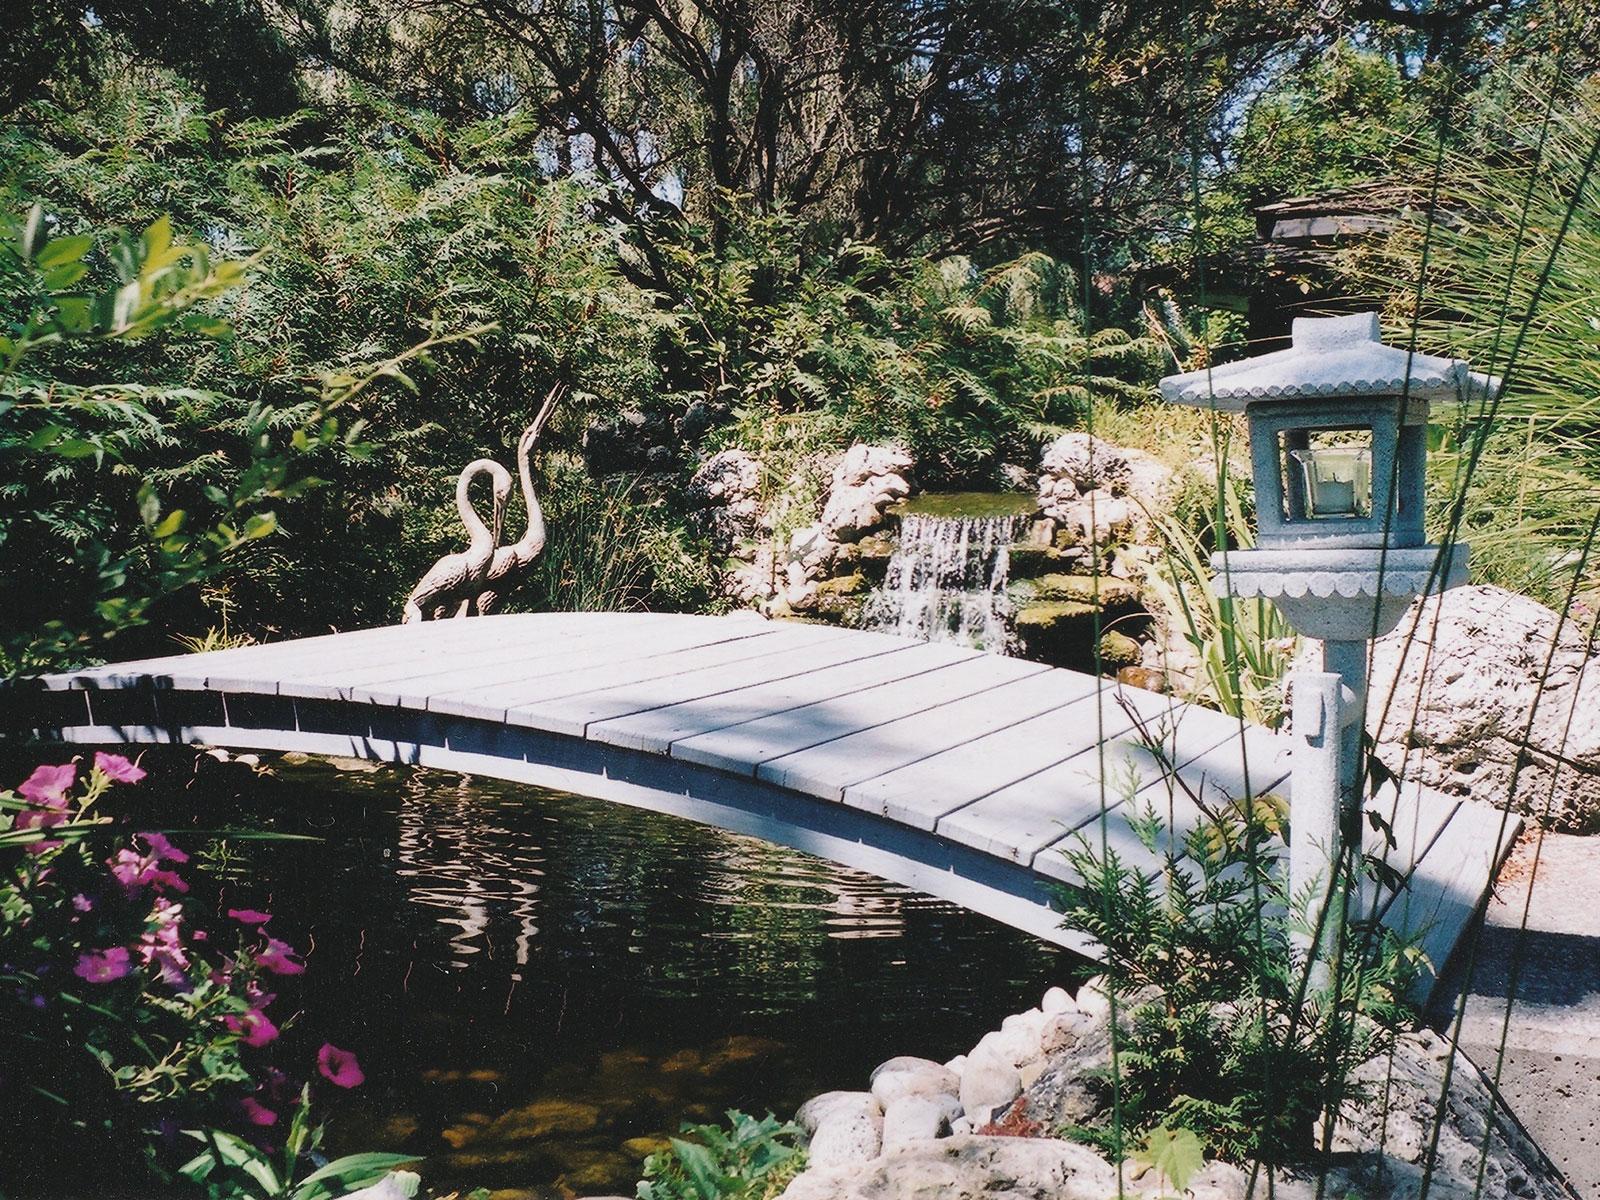 Aquascape Ecosystem Water Feature and bridge